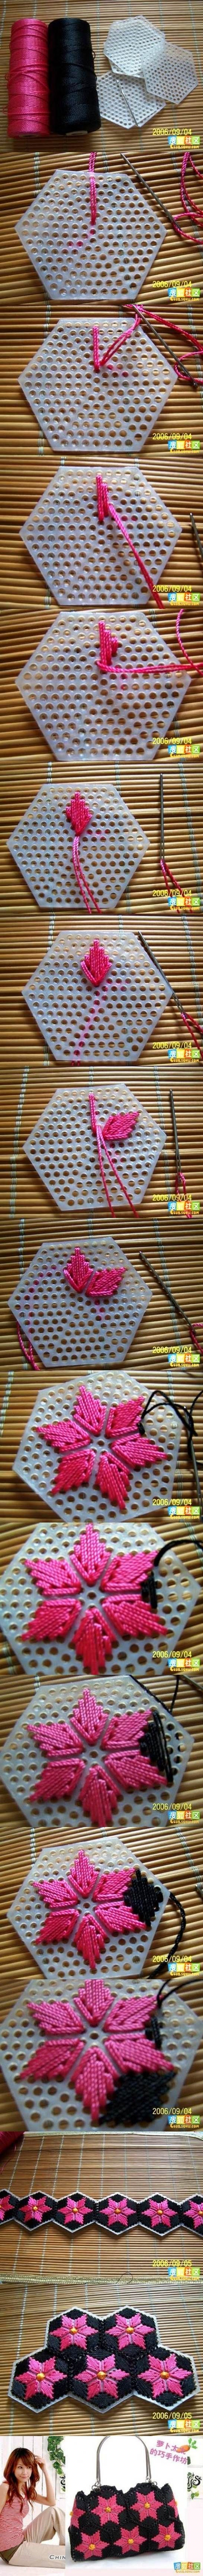 DIY Pretty Handbag from Stitch on Plastic Canvas   Basteln für ...